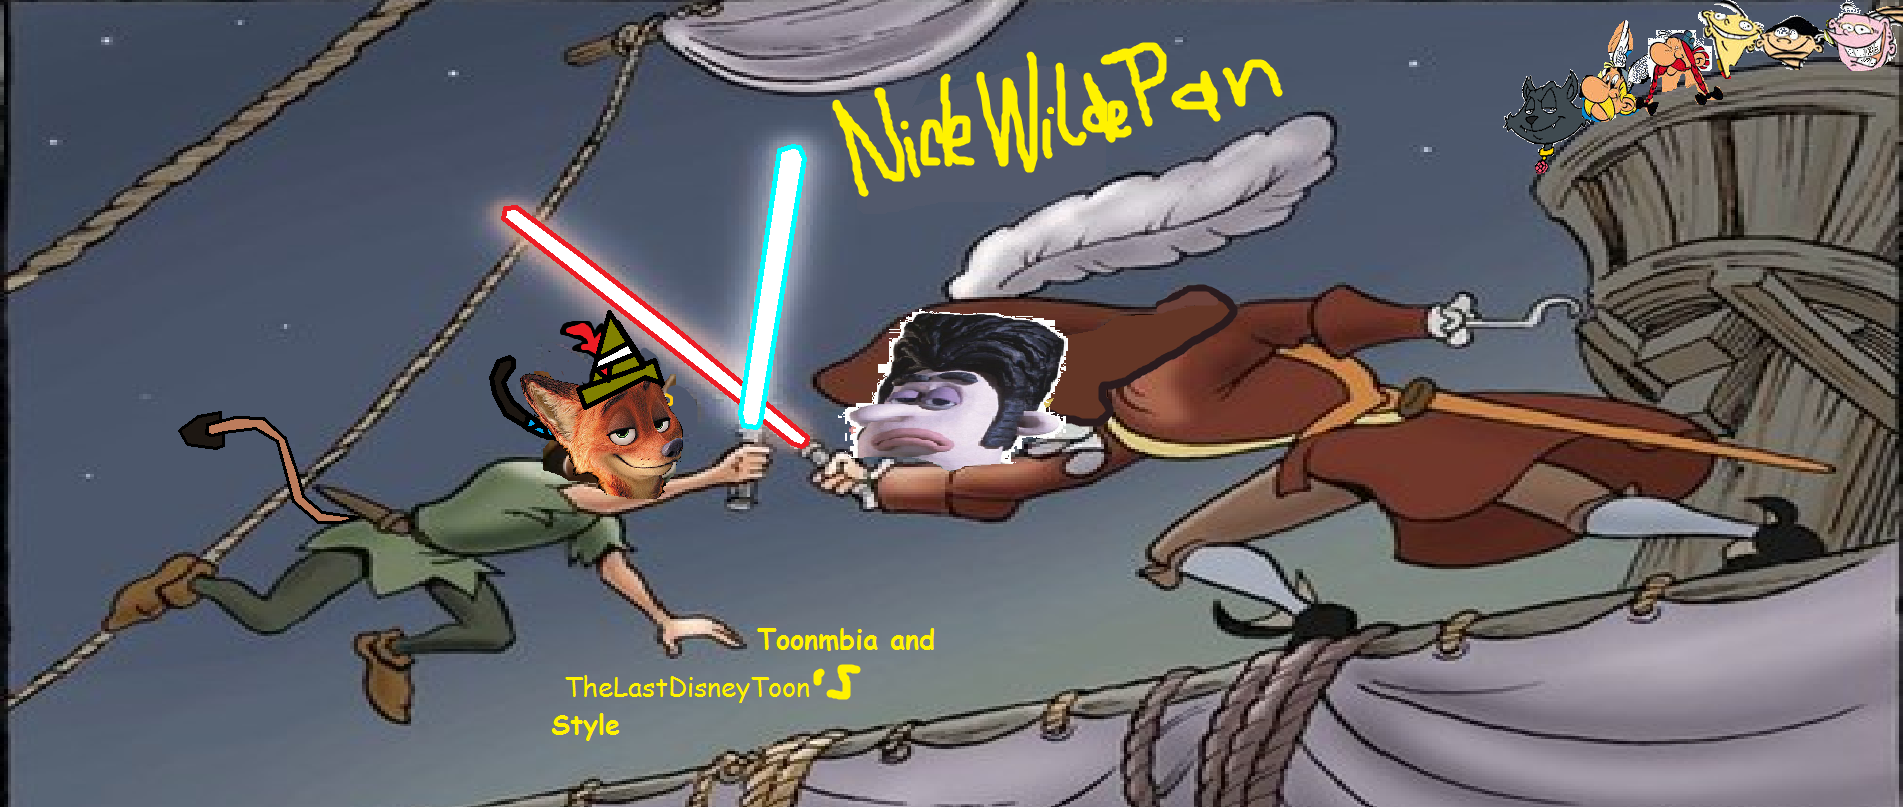 Nick Wilde Pan (TheLastDisneyToon and Toonmbia Style)